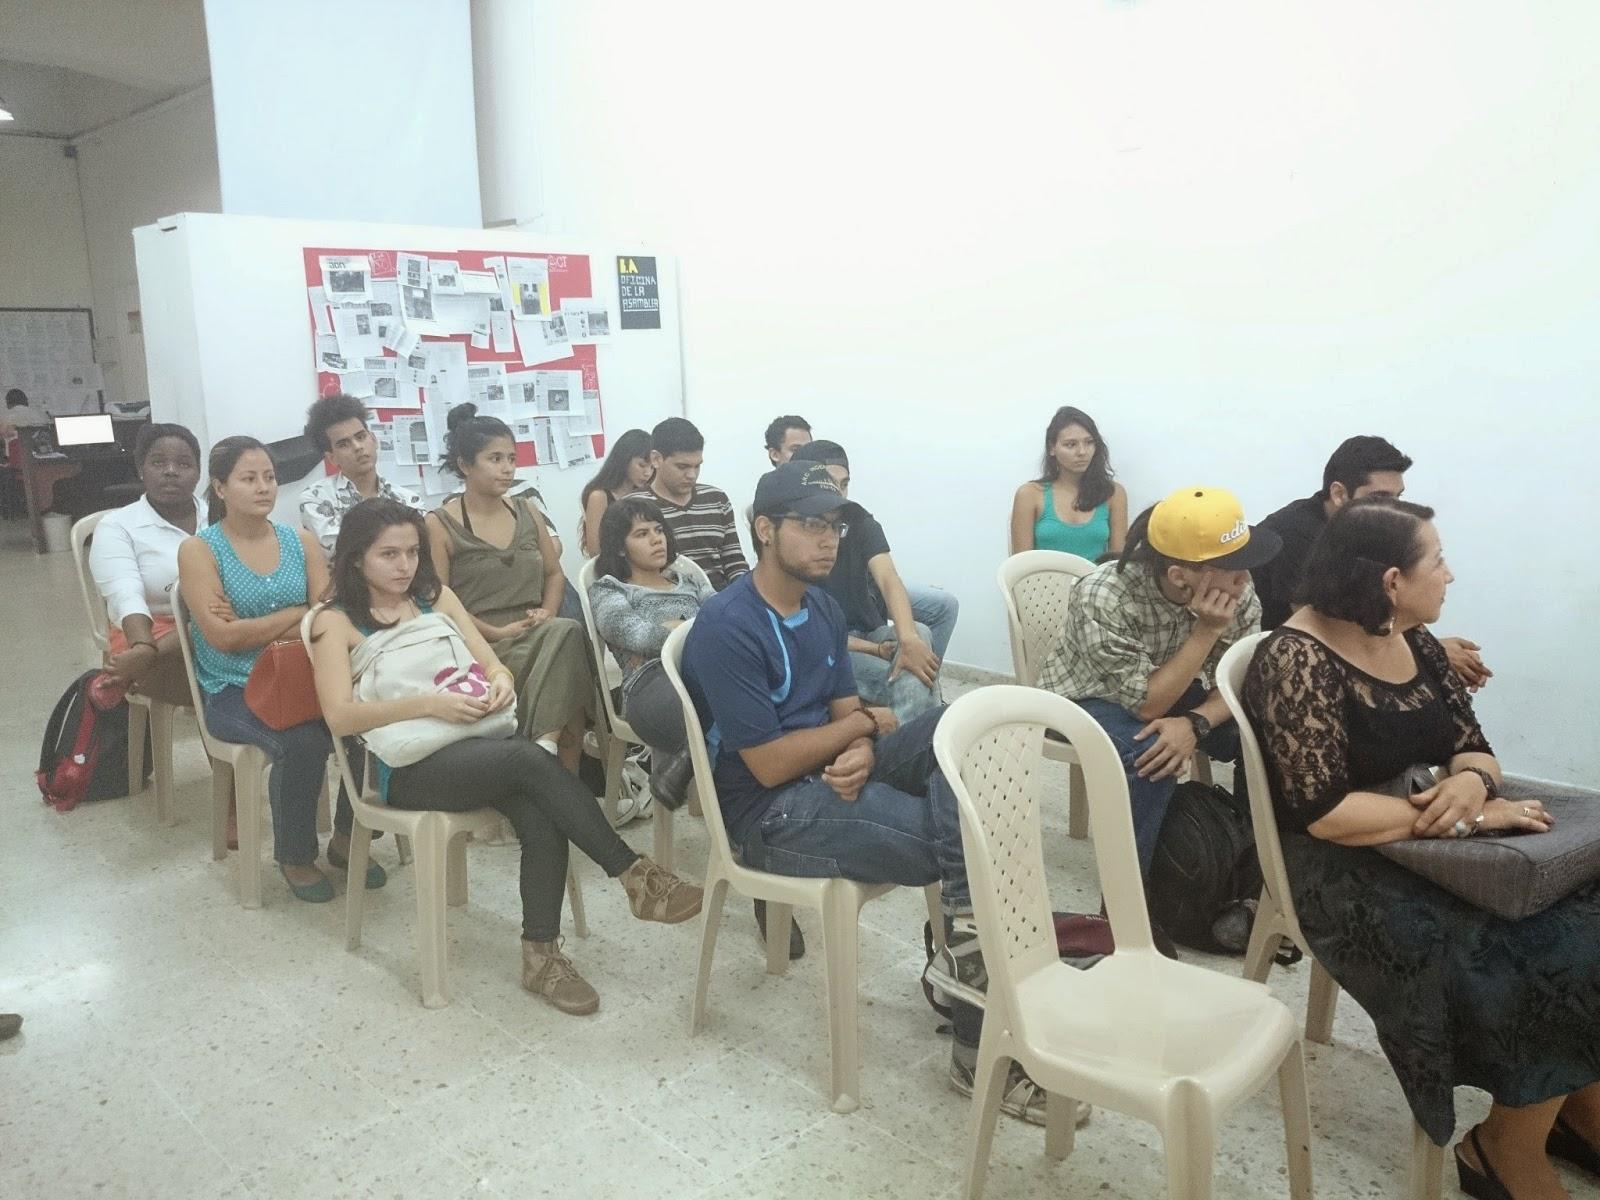 ec2252dc2 PRIMER ENCUENTRO DE POESÍA CALCO 2014- FUNDACIÓN HUMANA INTEGRAL ...